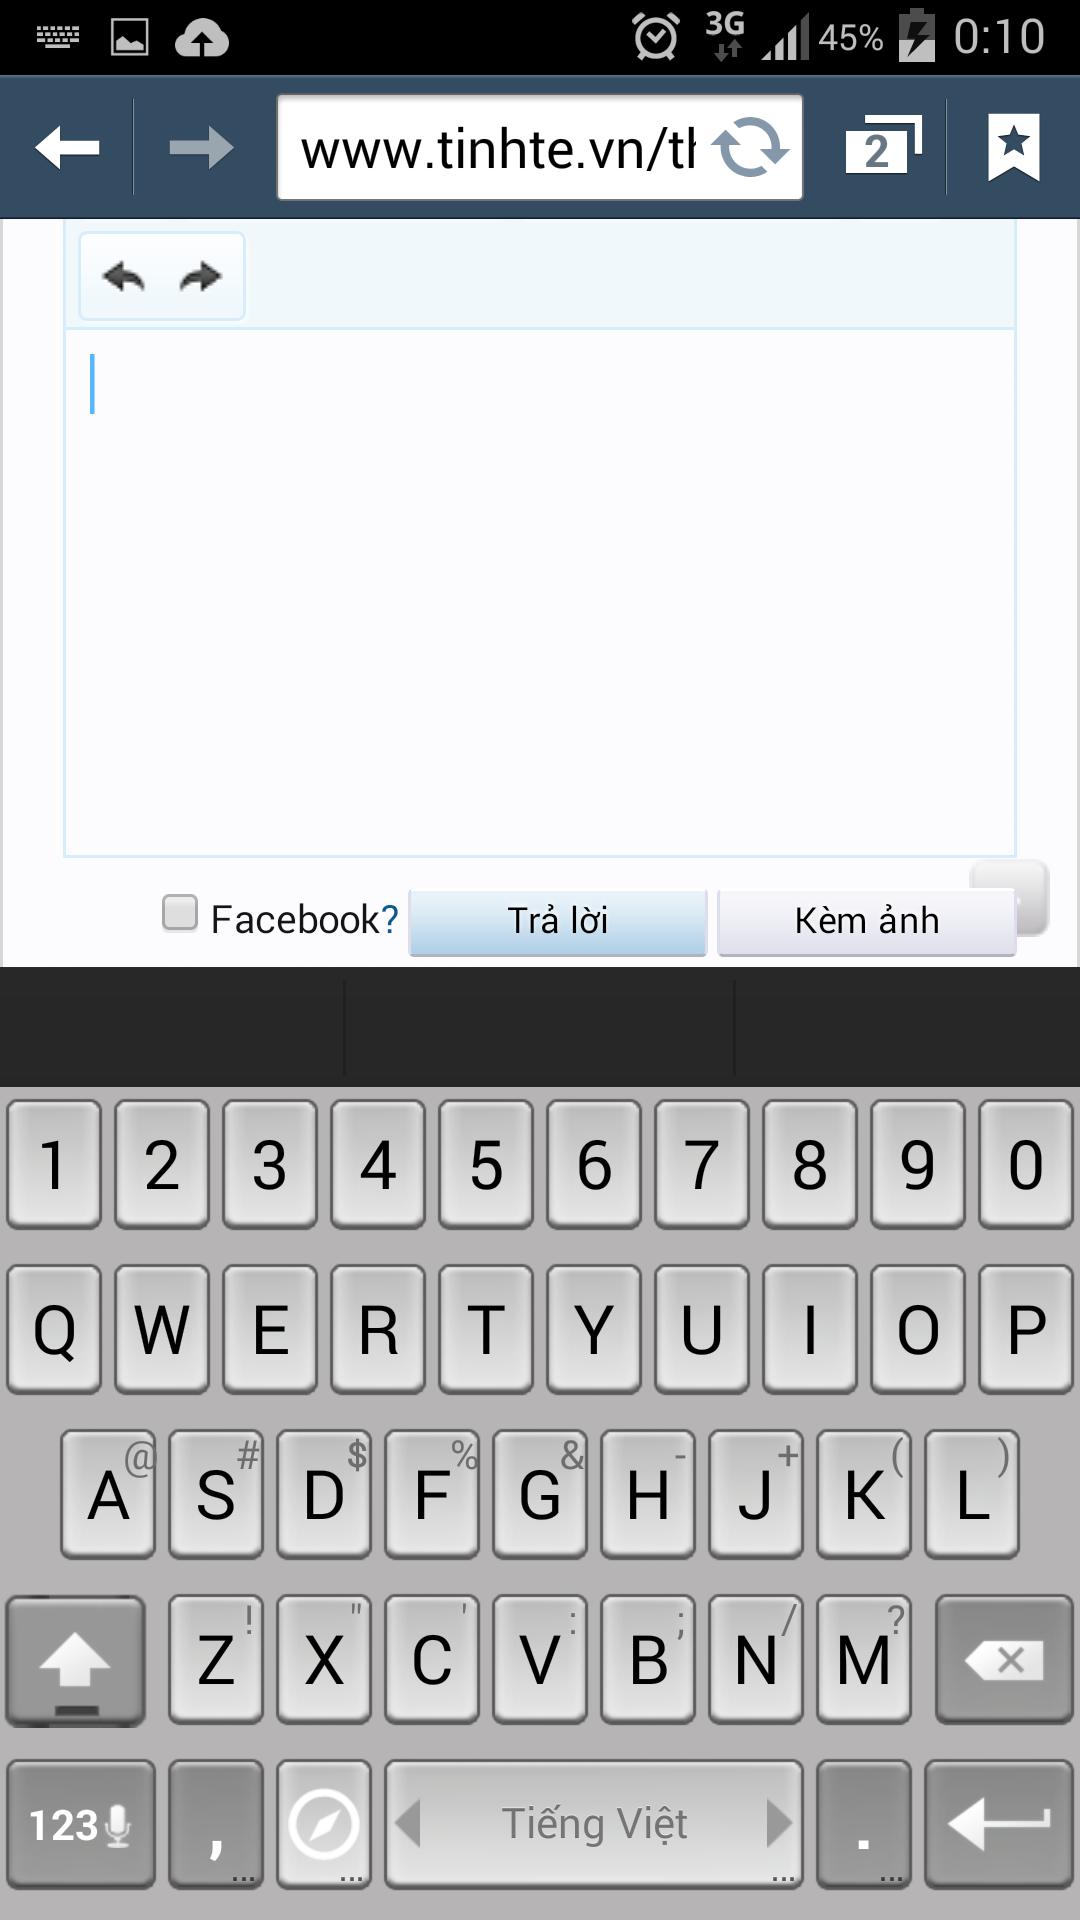 Screenshot_2014-04-26-00-10-47.png